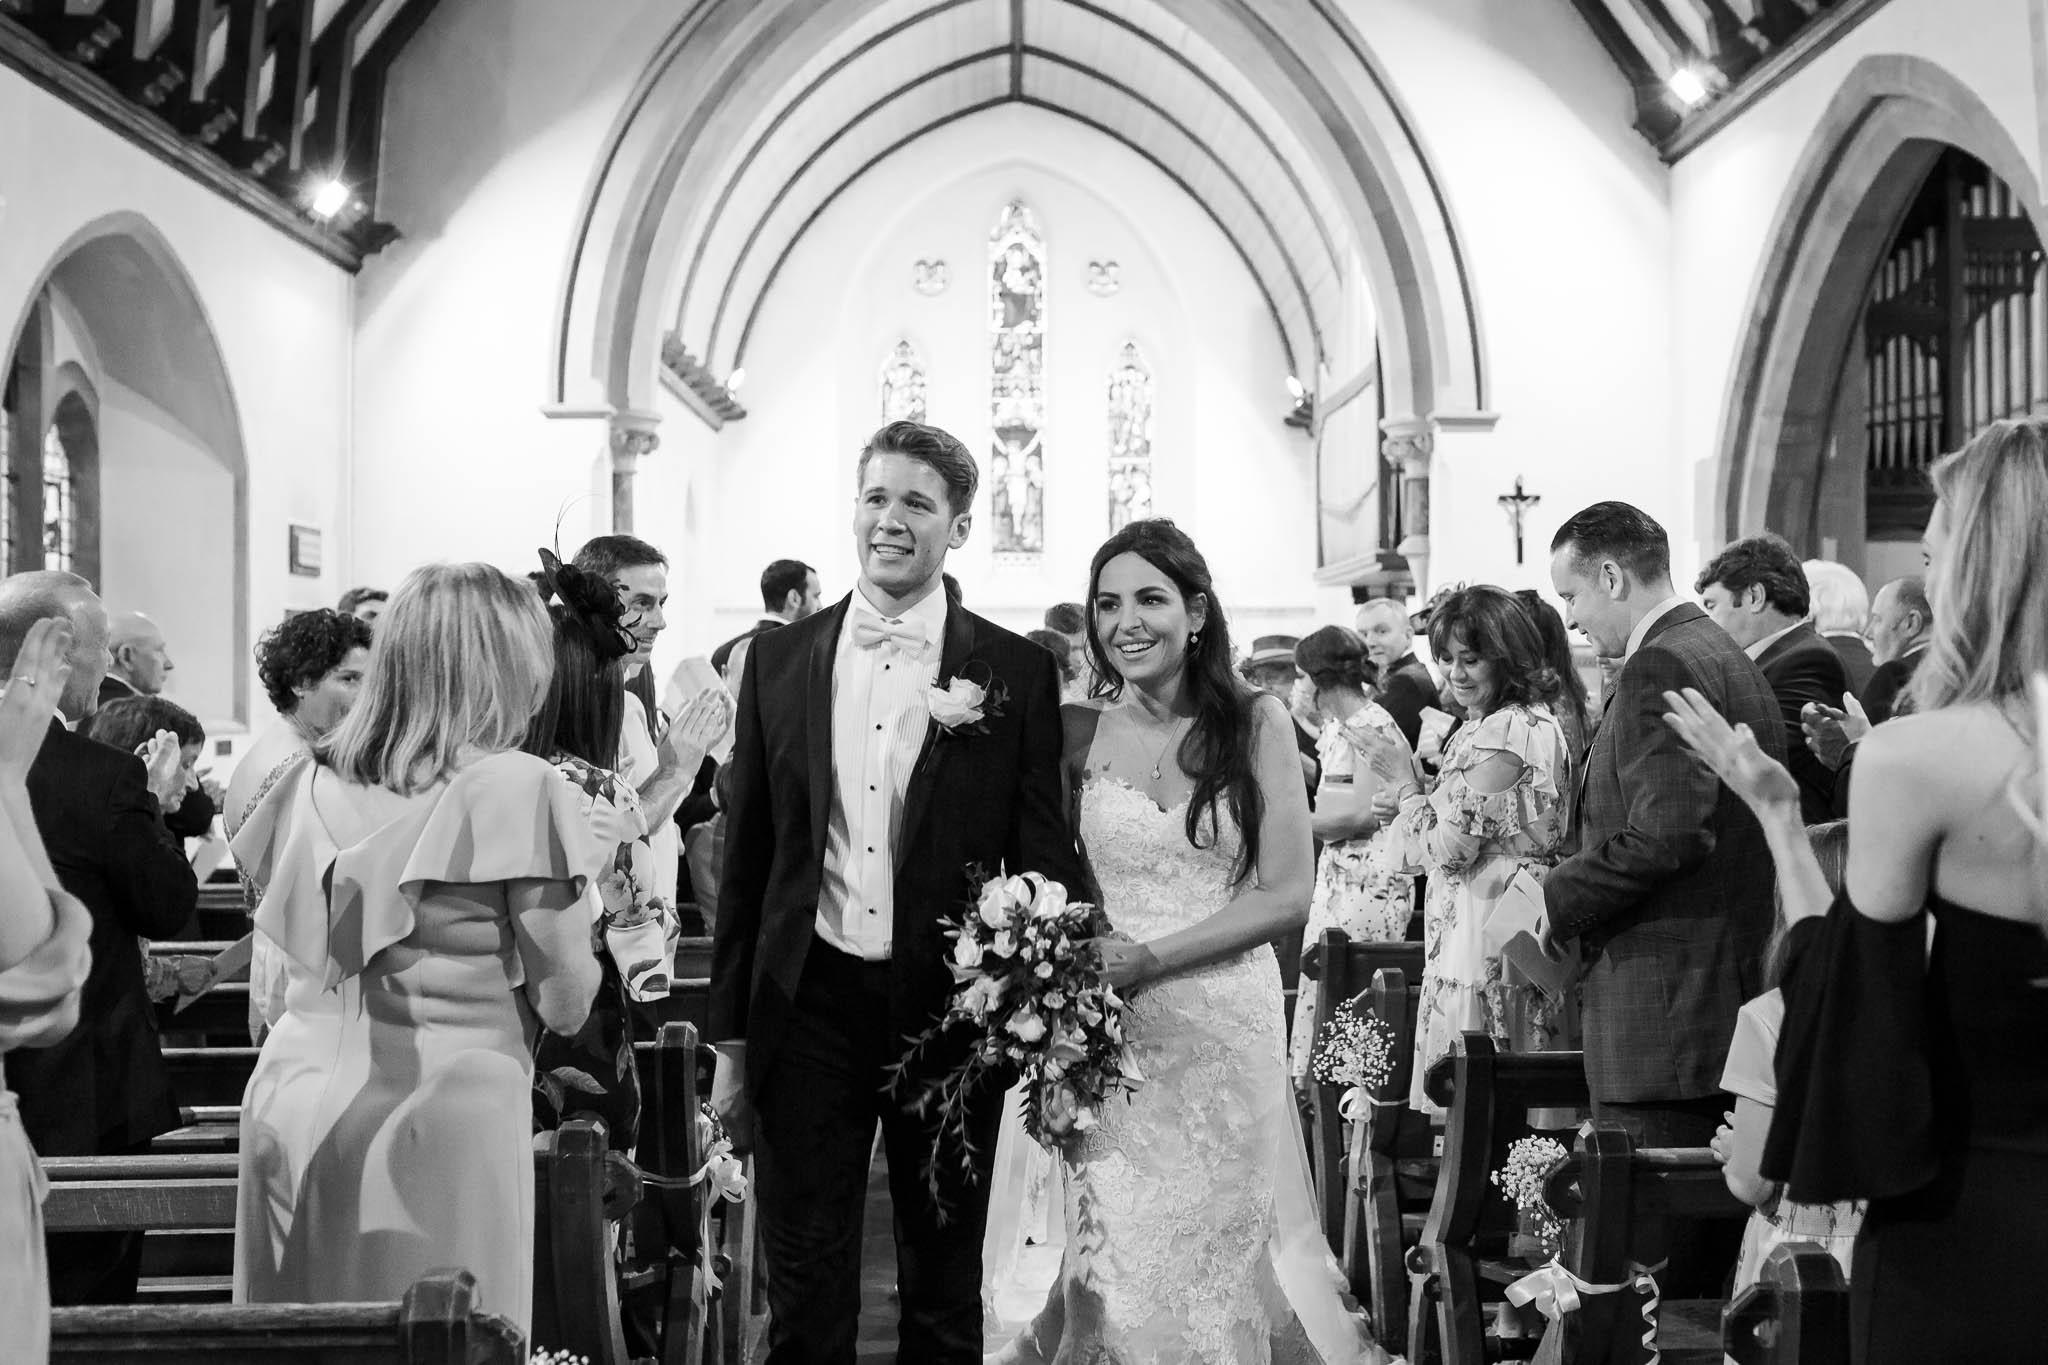 bride and groom walking down aisle - elegant and stylish wedding